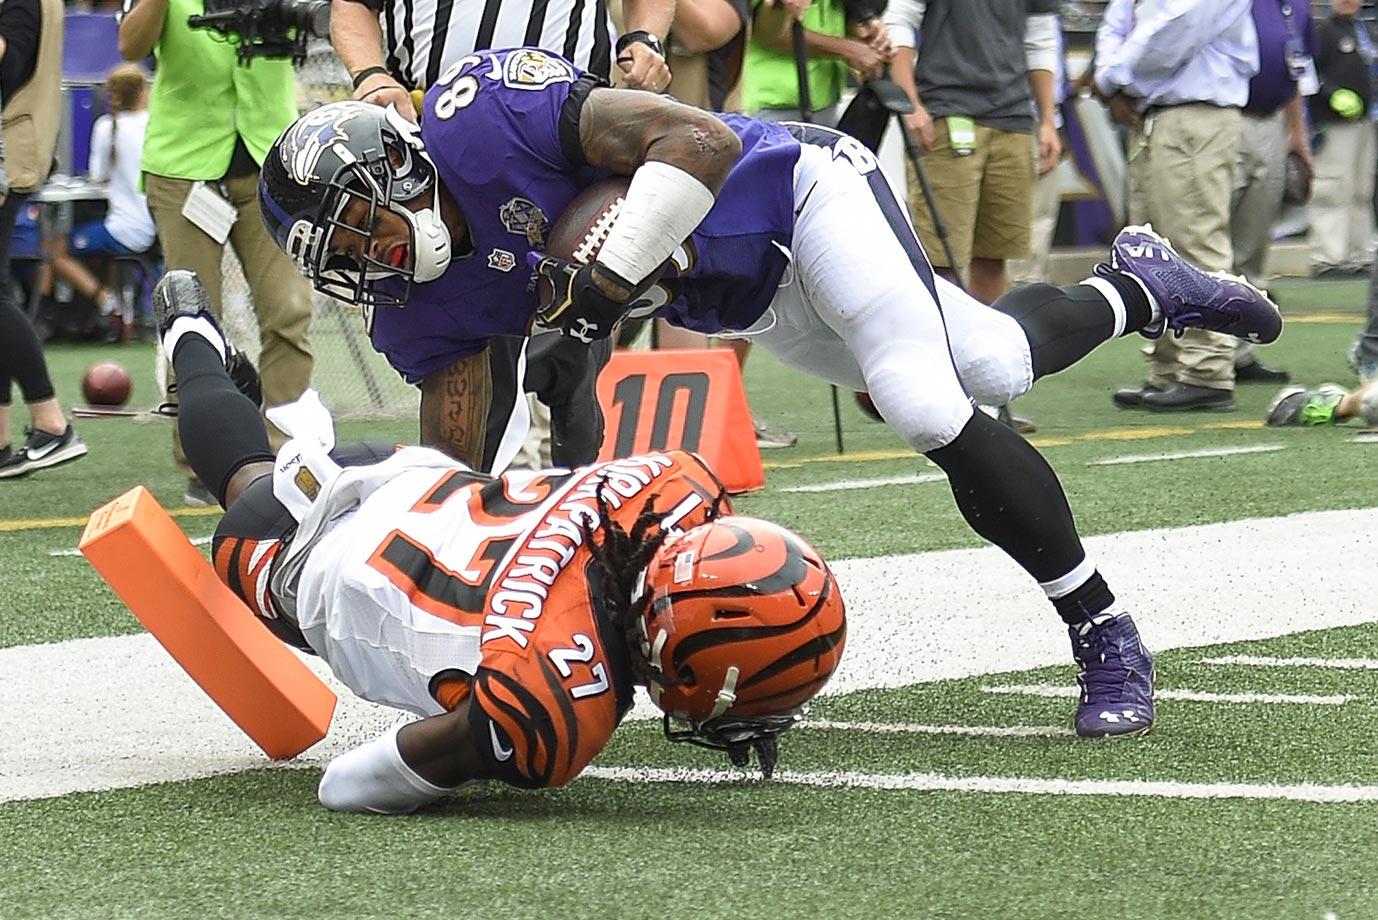 Steve Smith dives over Cincinnati cornerback Dre Kirkpatrick for a touchdown.